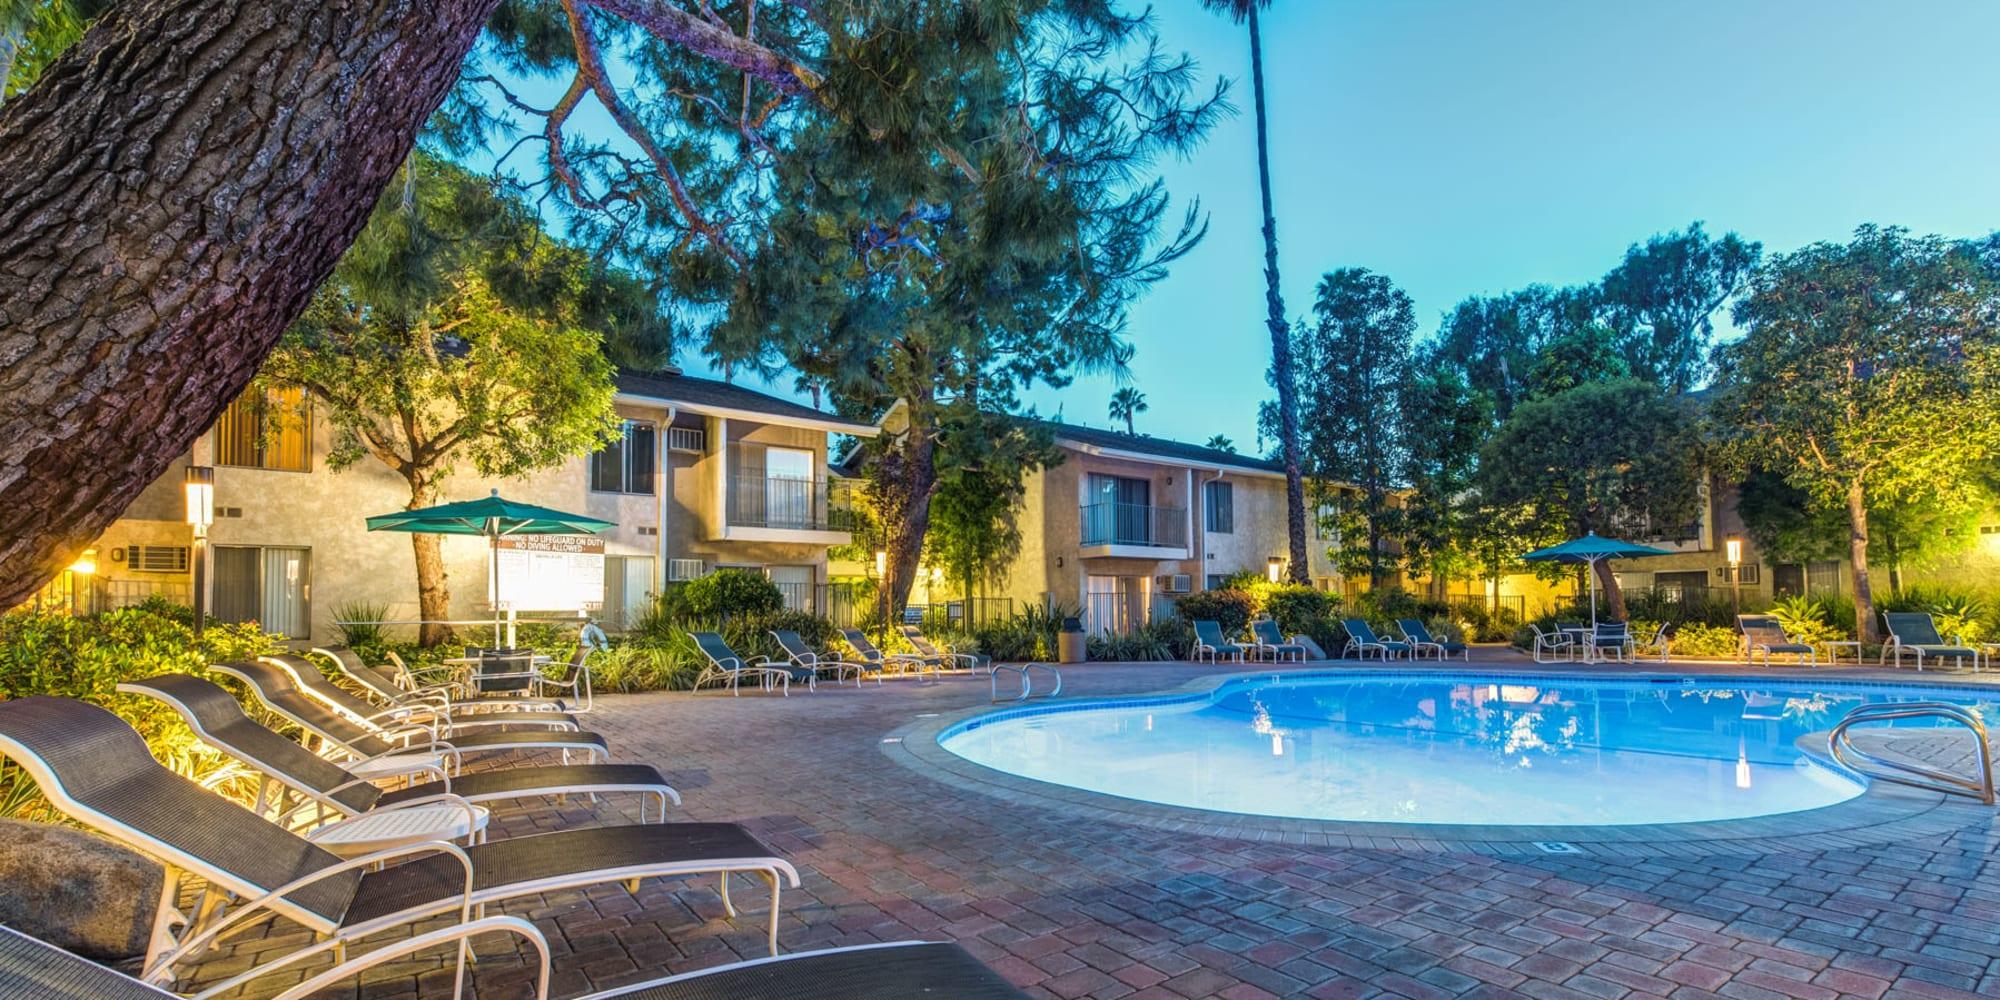 Underwater lights illuminating the pool at twilight at Village Pointe in Northridge, California